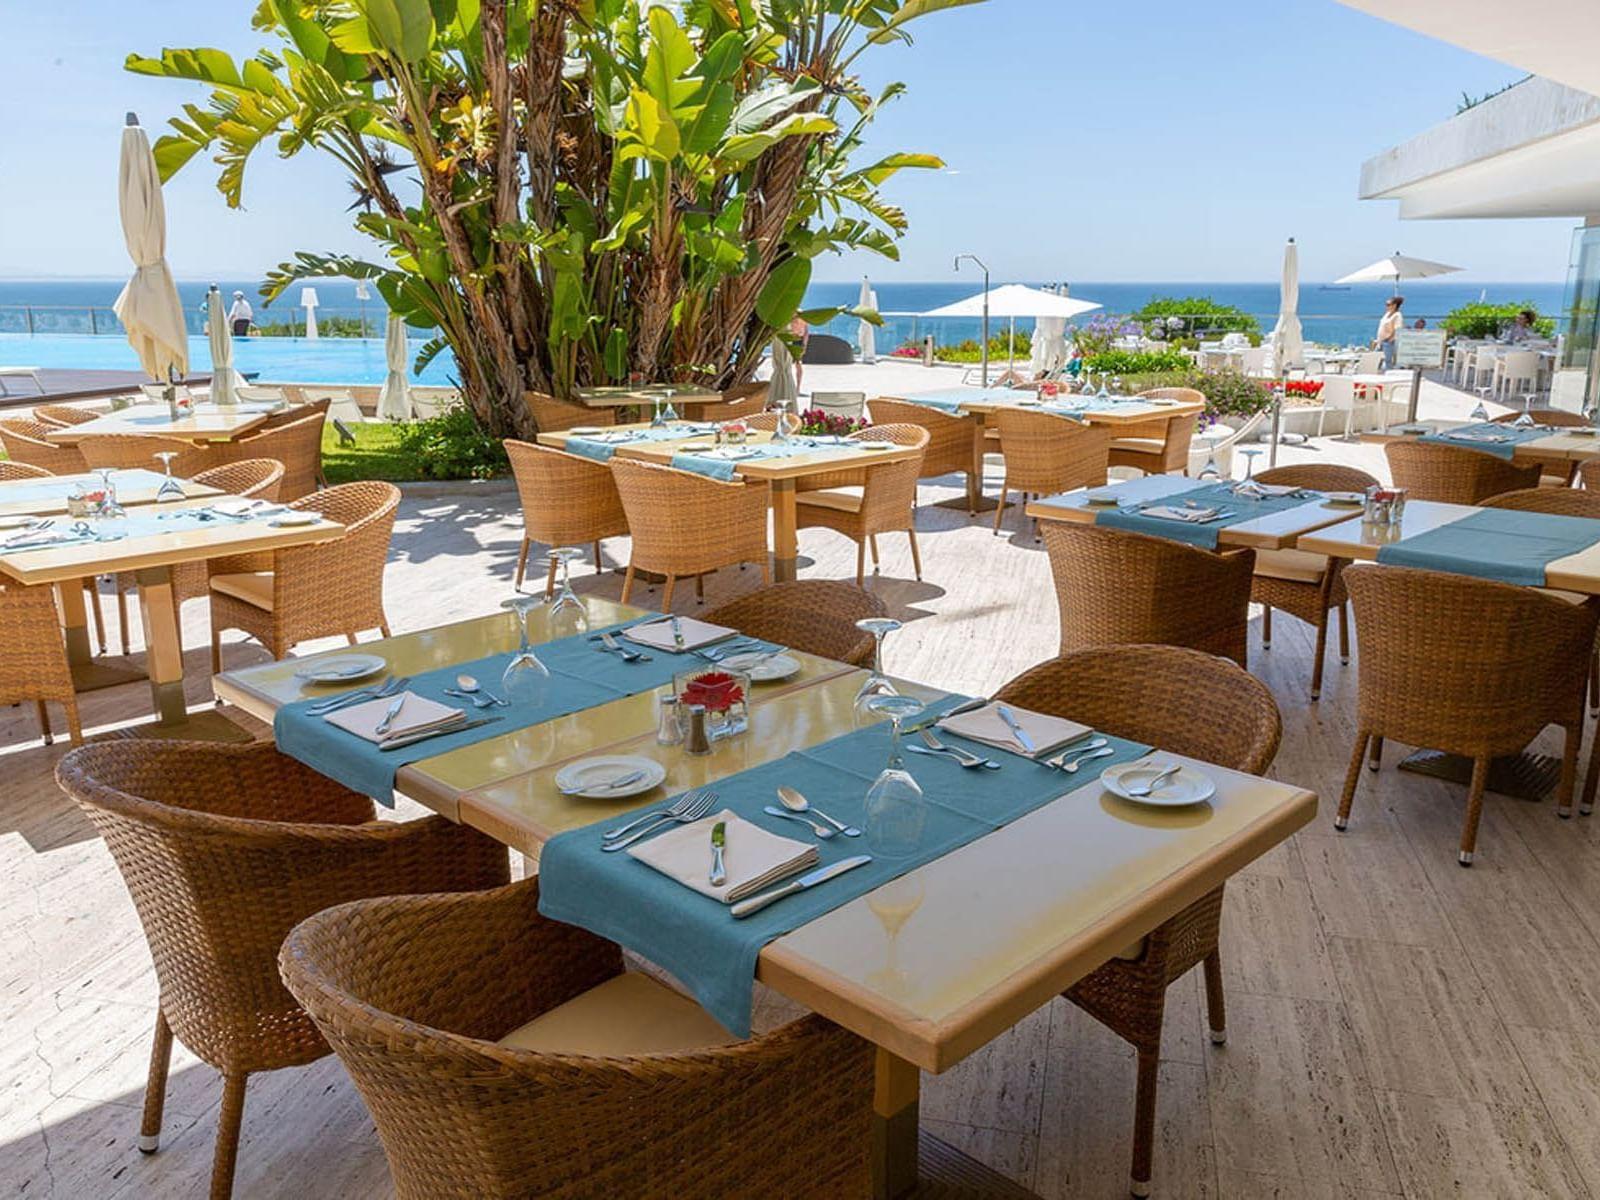 Outdoor Restaurant facing the beach at Hotel Cascais Miragem